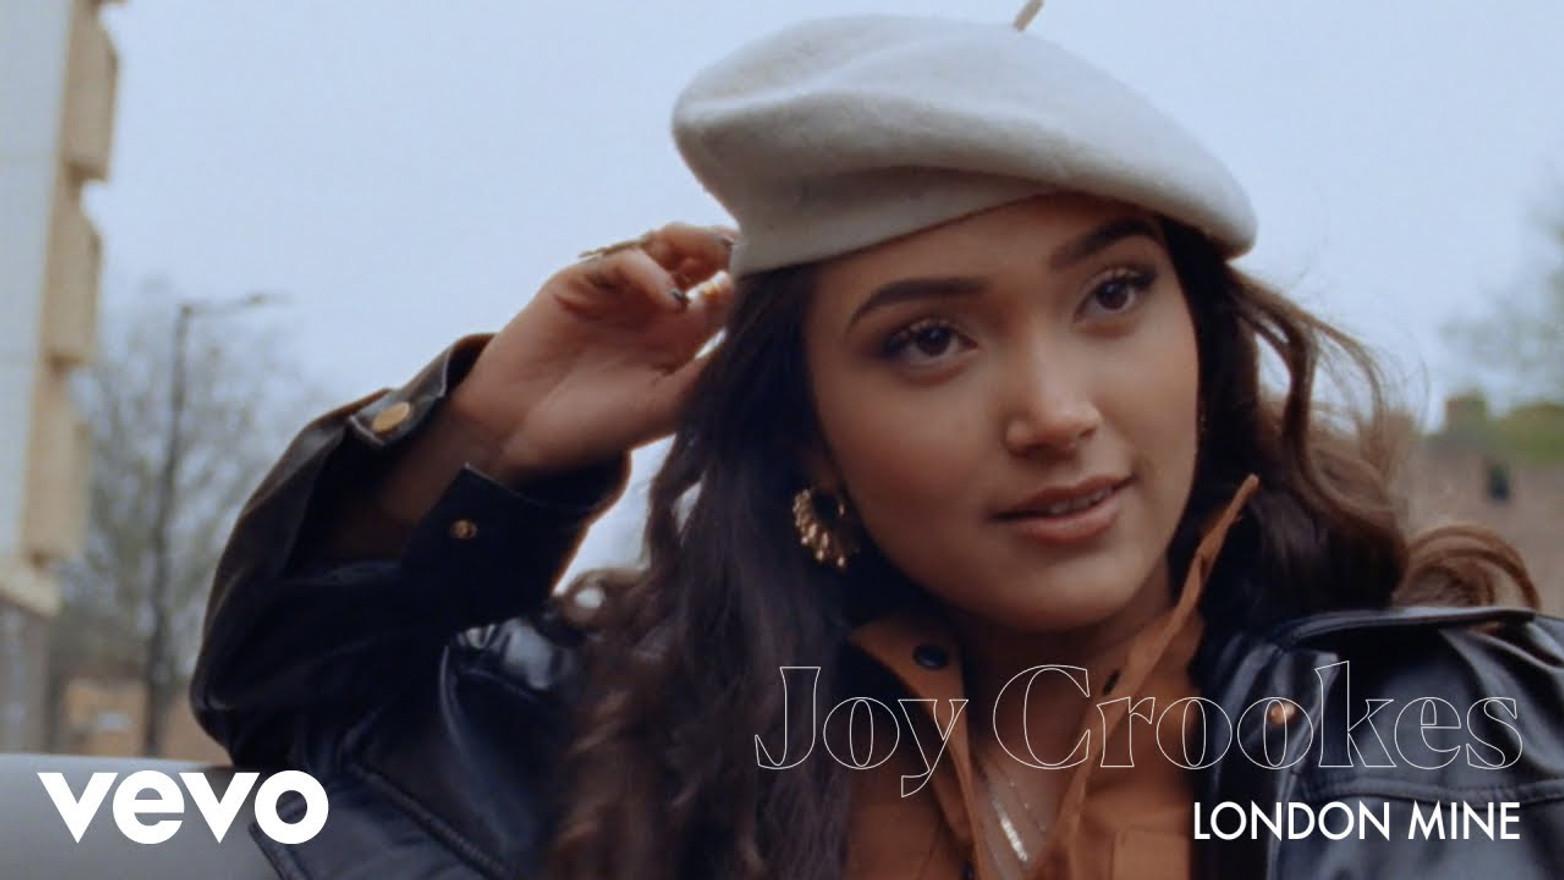 Joy Crookes - London Mine (Official Video) | Justin